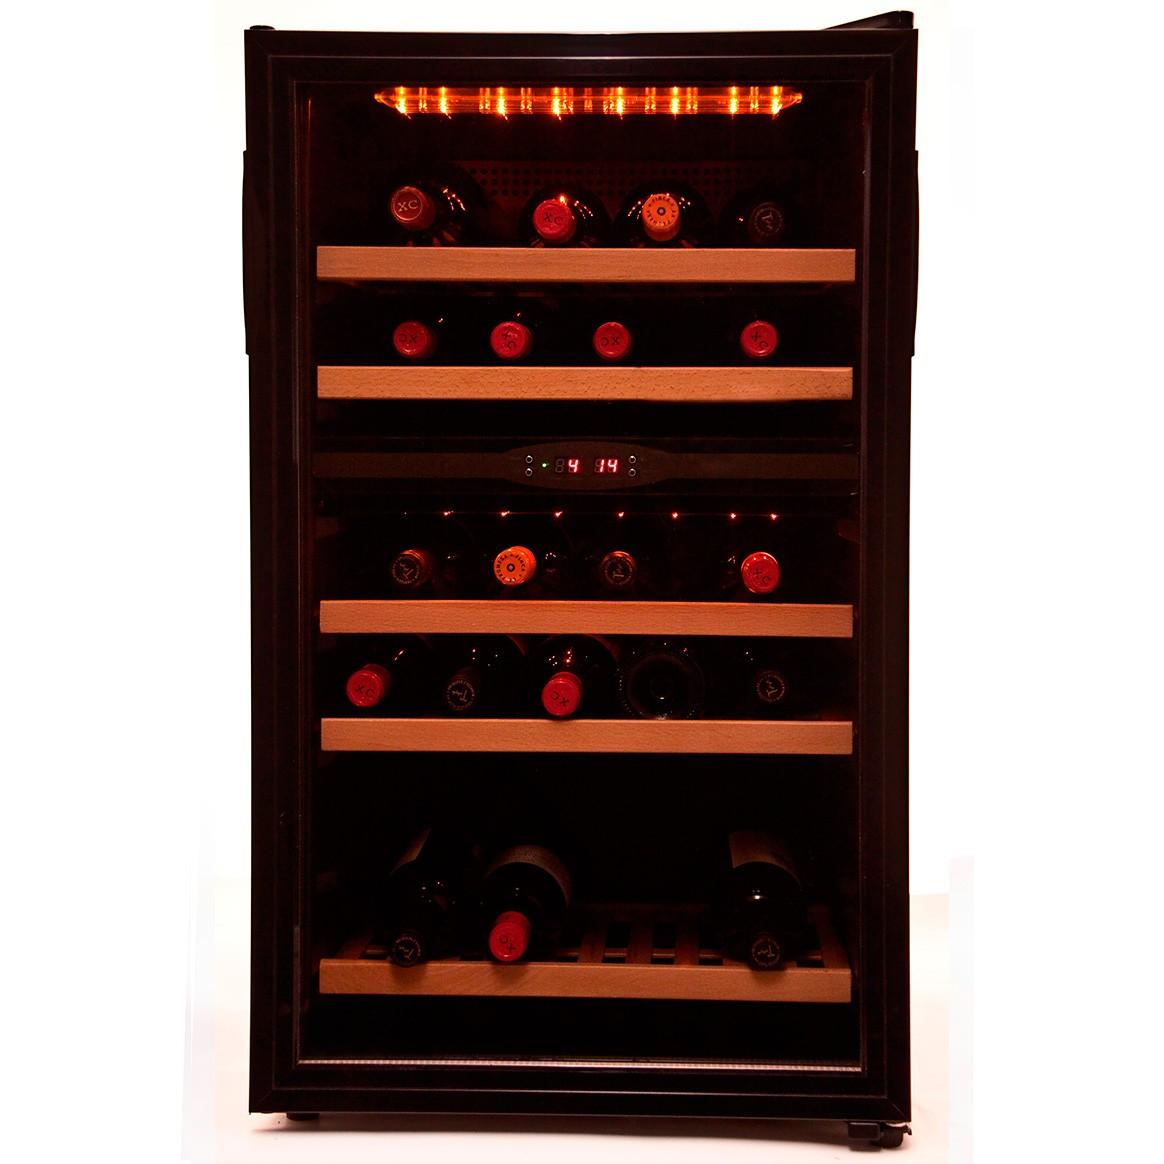 Vinoteca 40 botellas 40pc 2t doble zona temperatura - Vinoteca 2 temperaturas ...